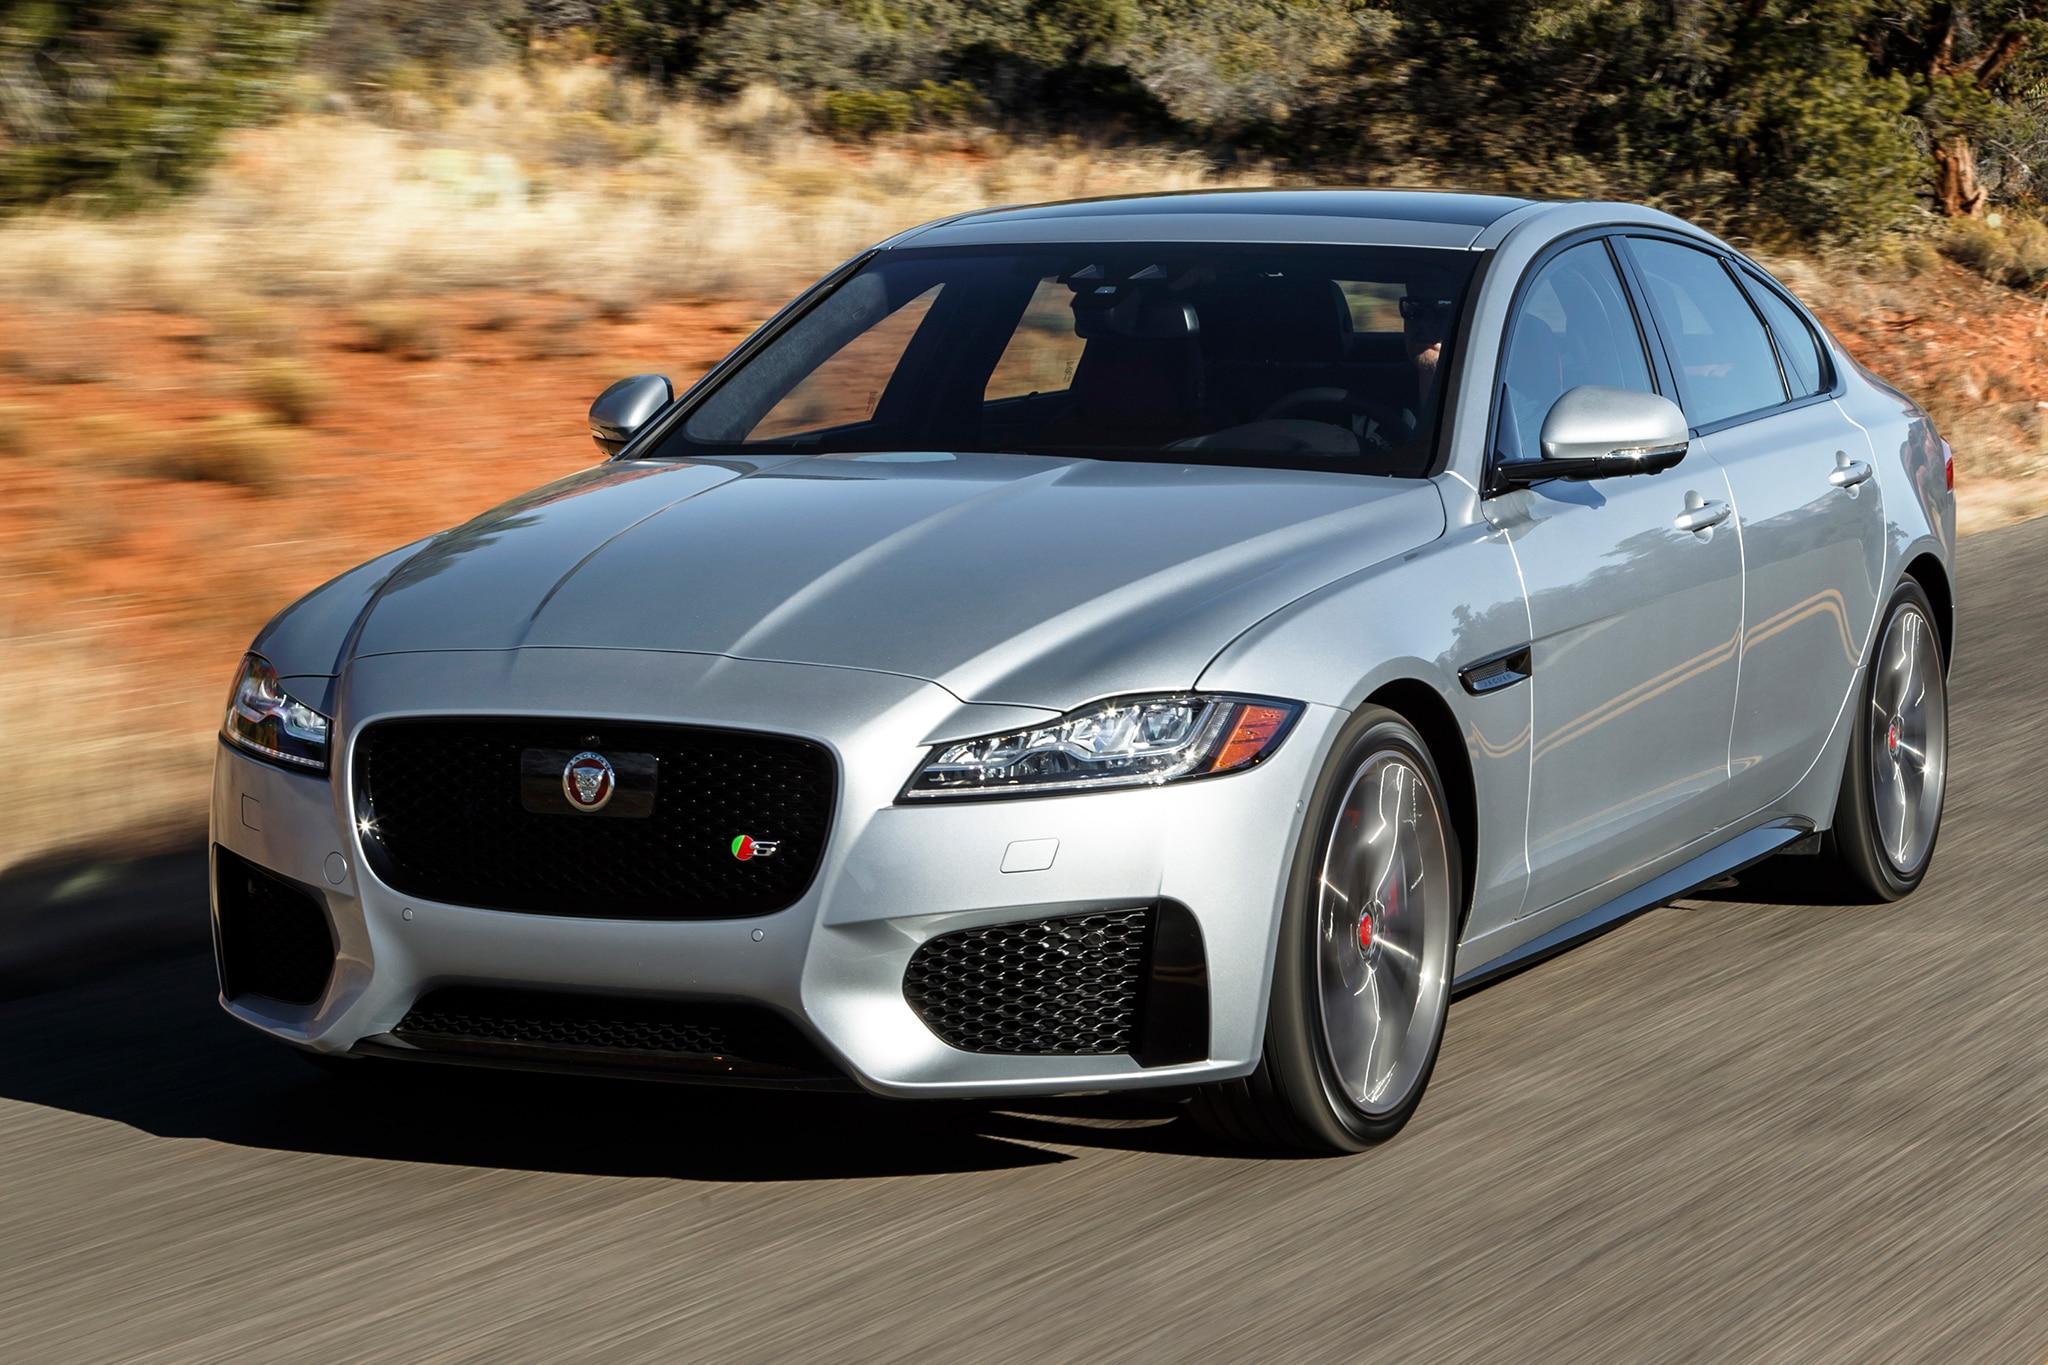 2016 Jaguar XF S front three quarter in motion 16 - Automobile